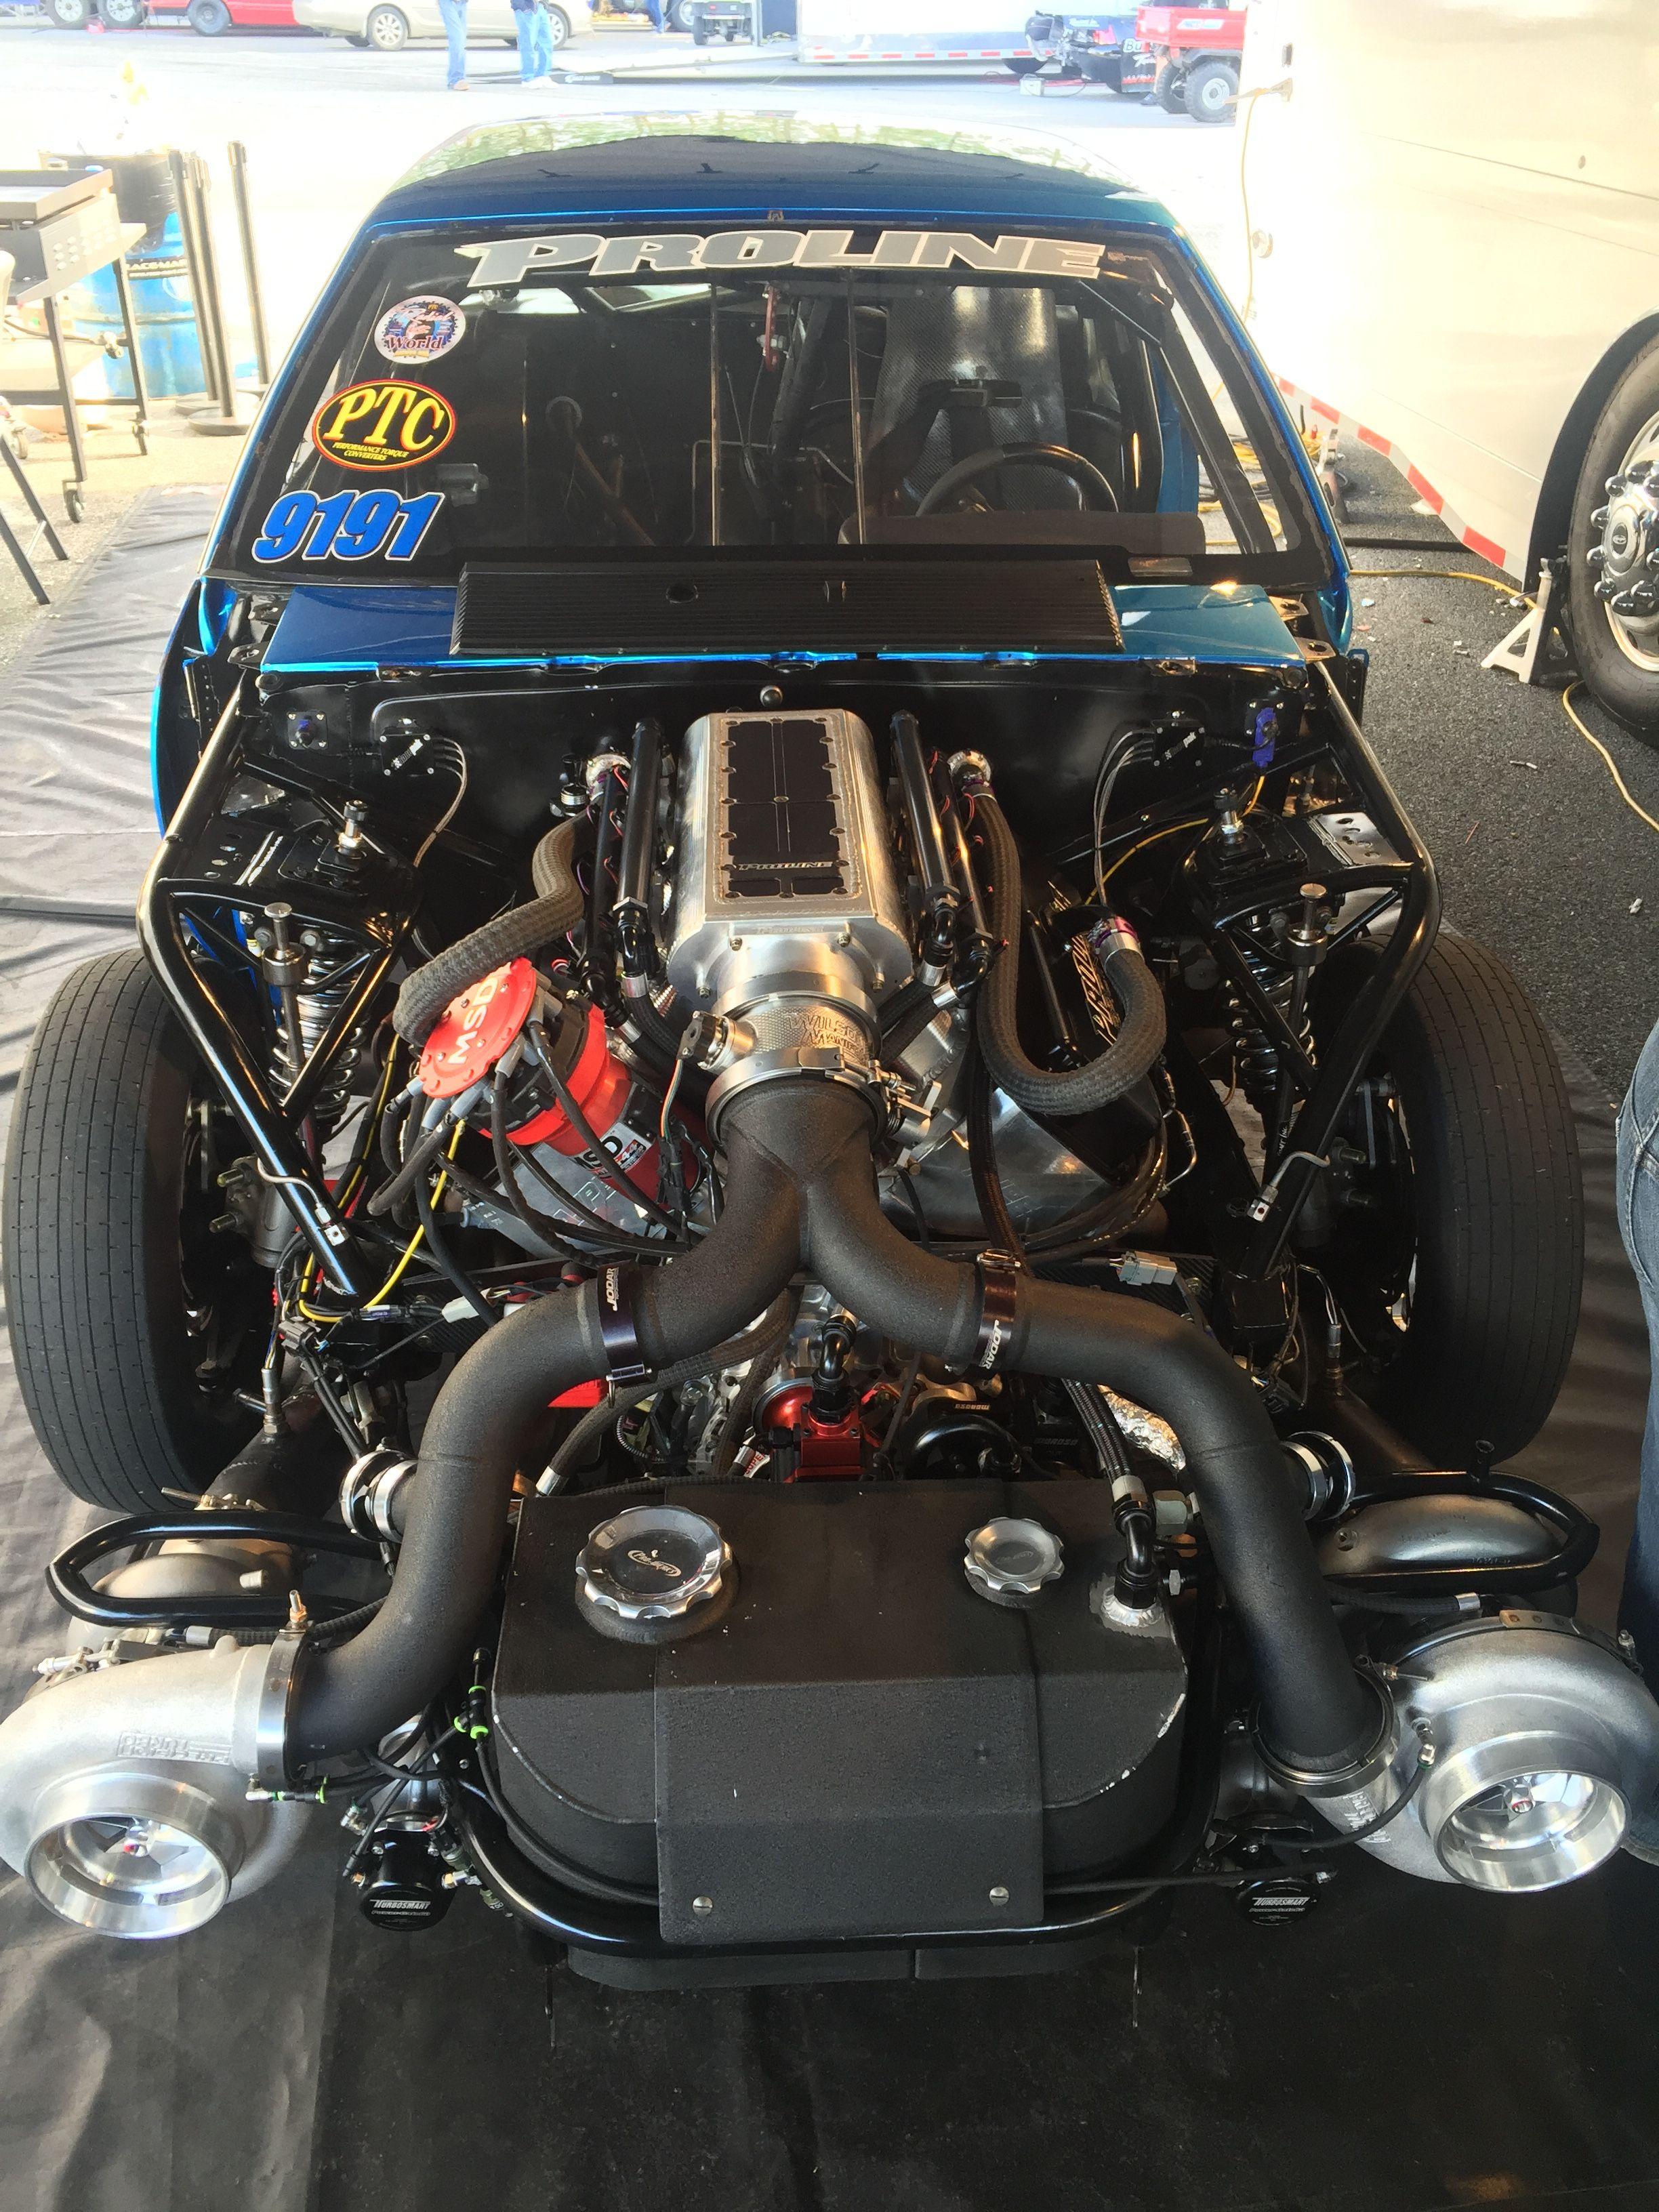 medium resolution of fletcher cox 481x 572 motor turbo car twin turbo trucks and girls